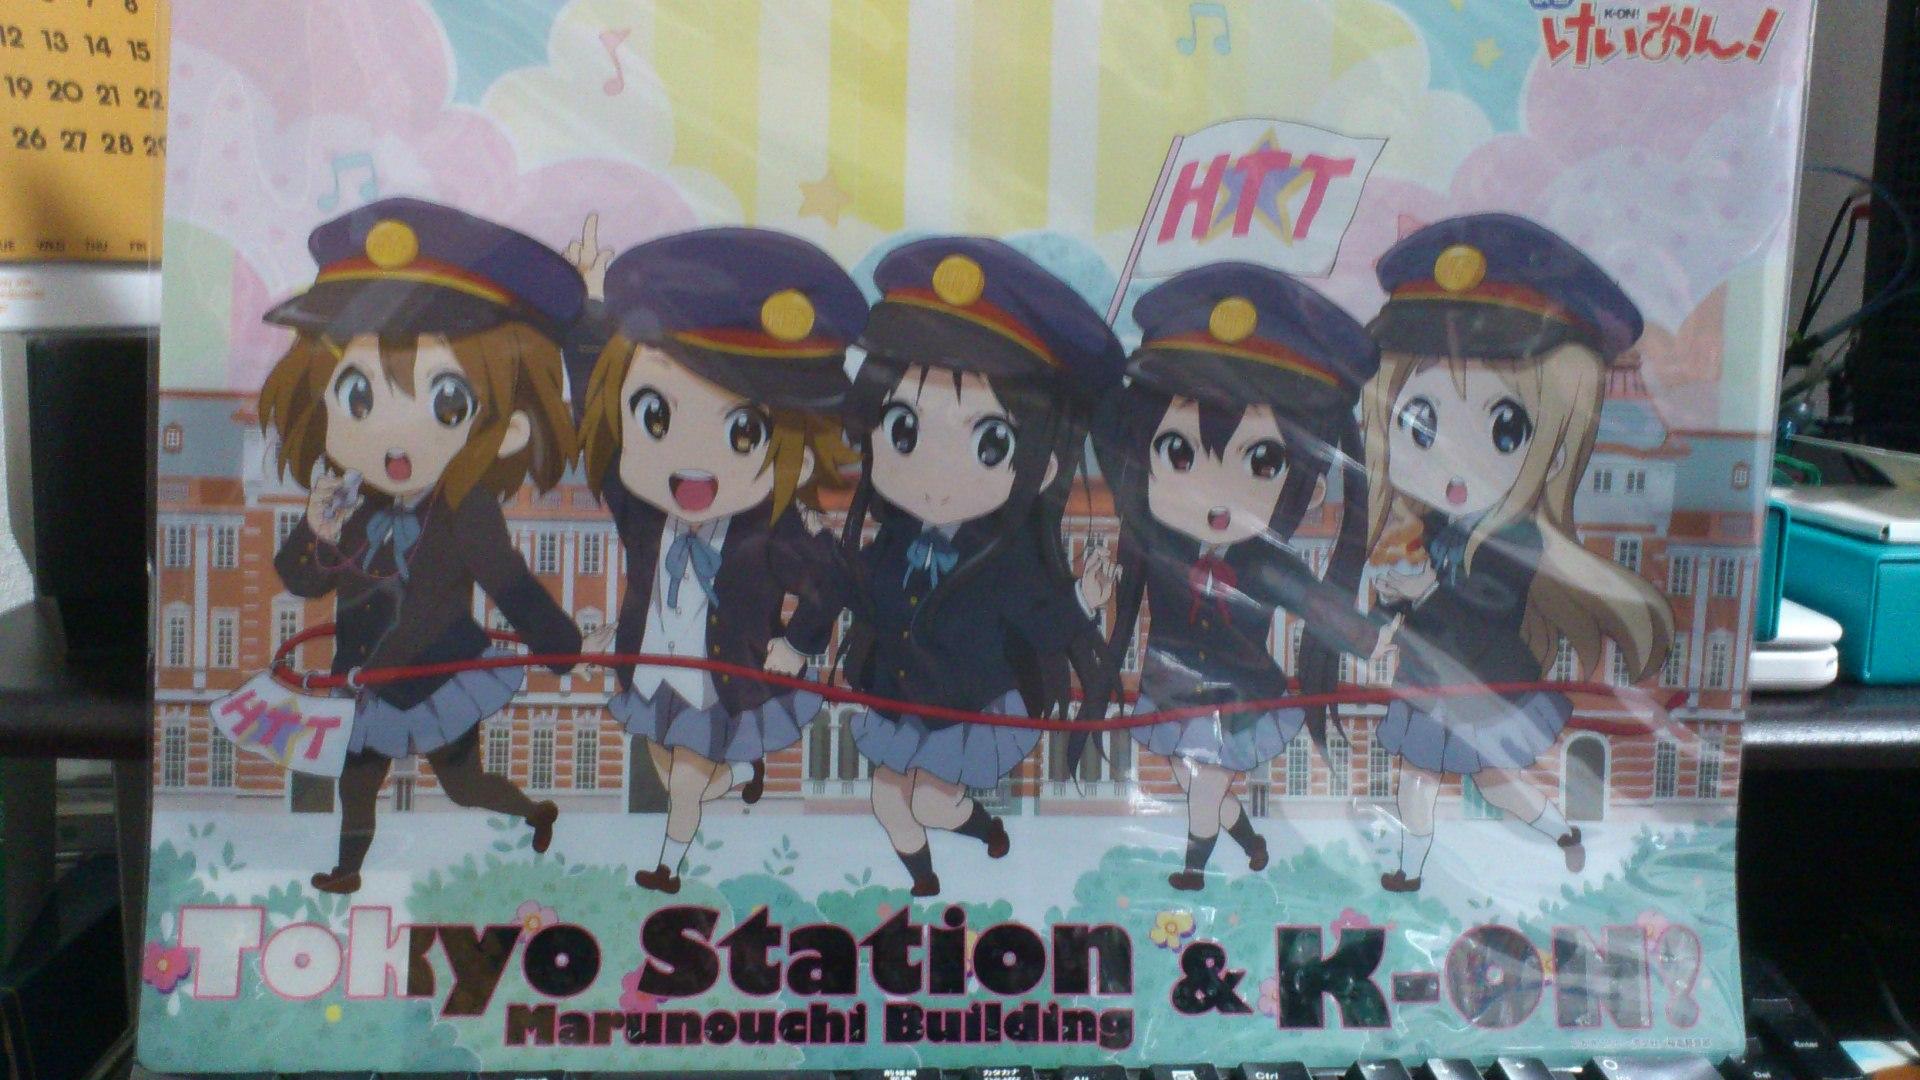 http://blog-imgs-57.fc2.com/t/a/m/tamajiro/DSC_0597.jpg